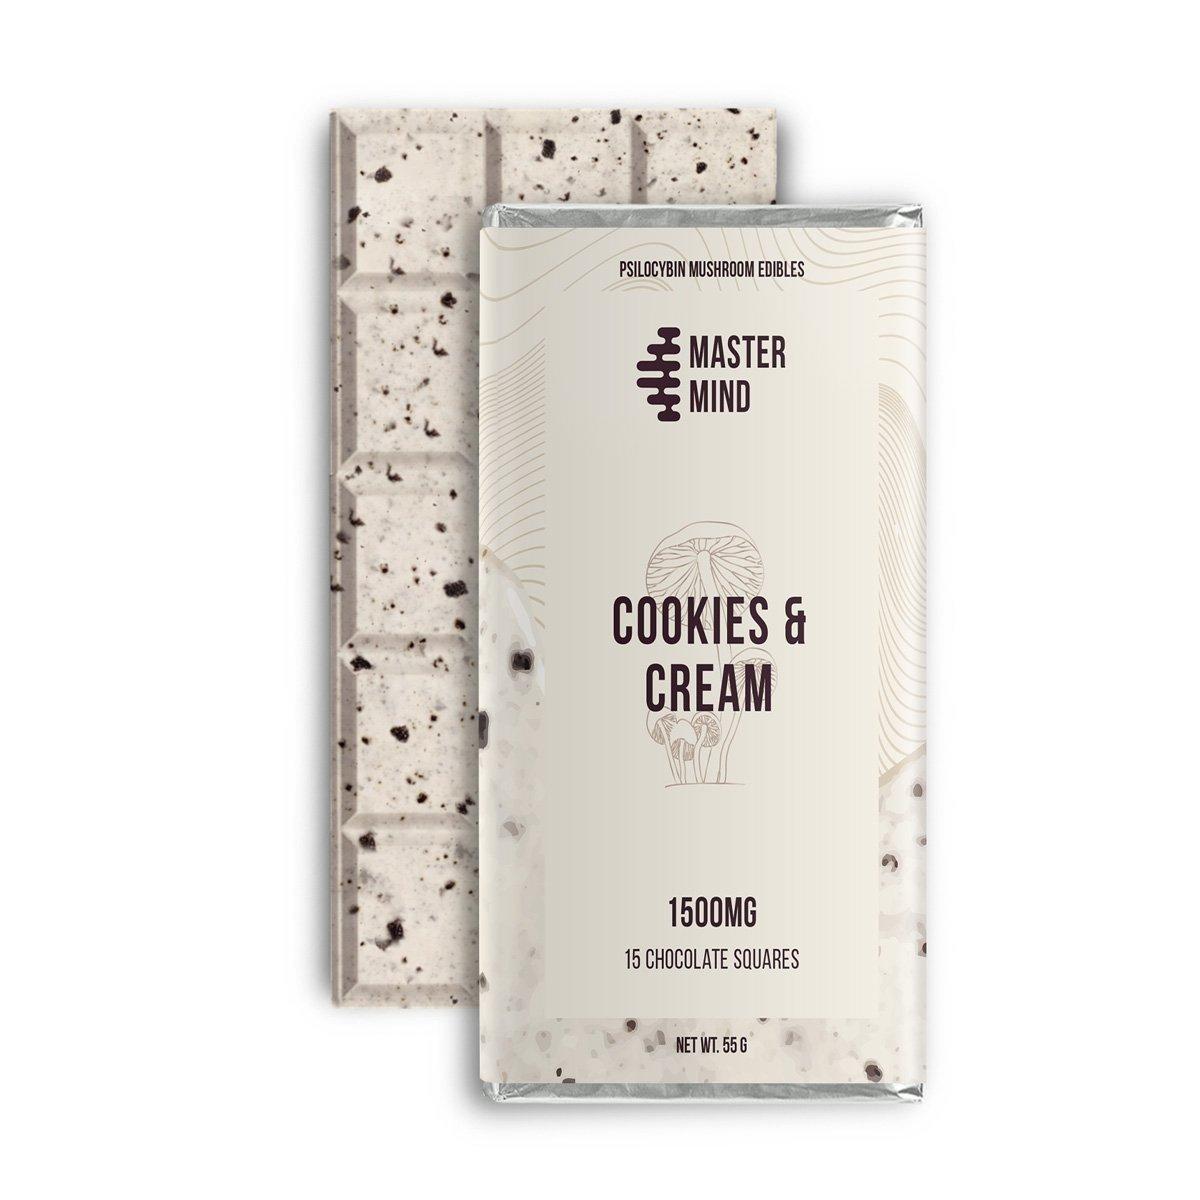 Master Mind - Cookies and Cream Chocolate - 1500 Mg